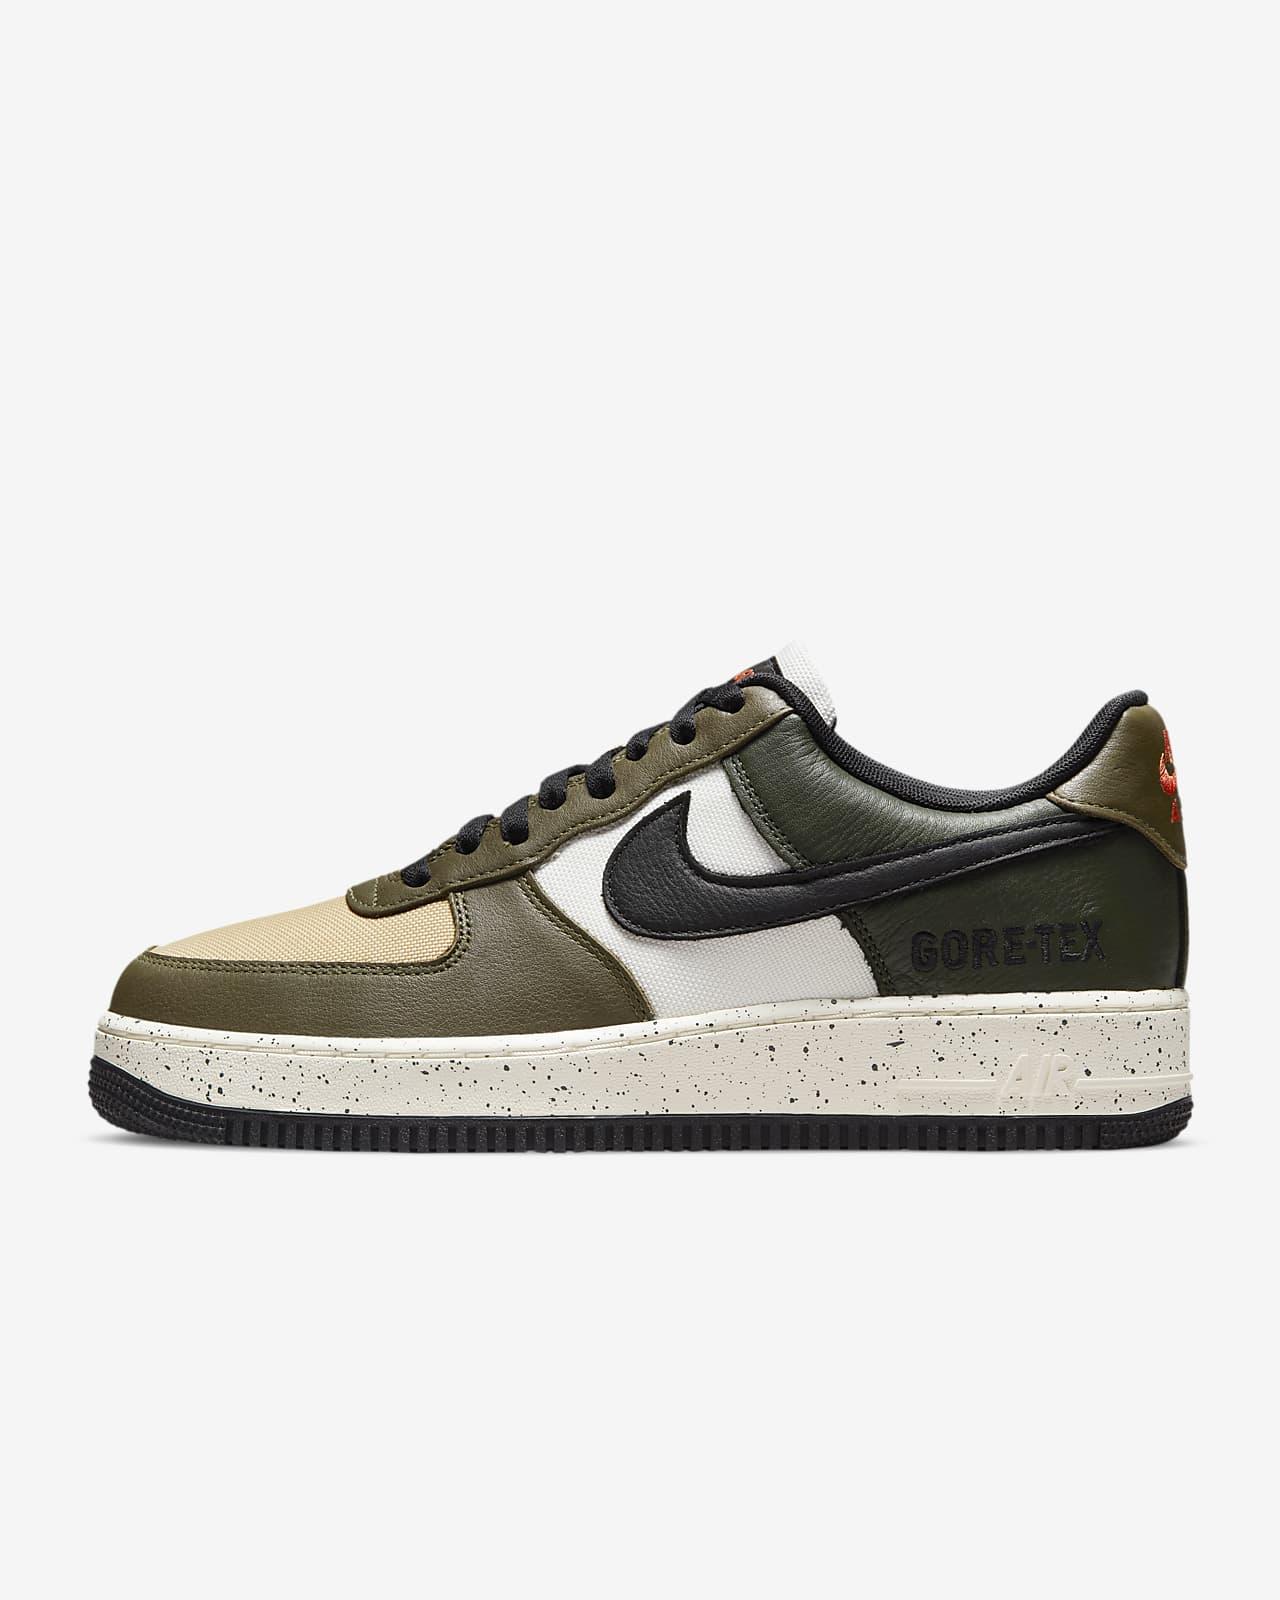 Nike Air Force 1 GORE-TEX ® Men's Shoes